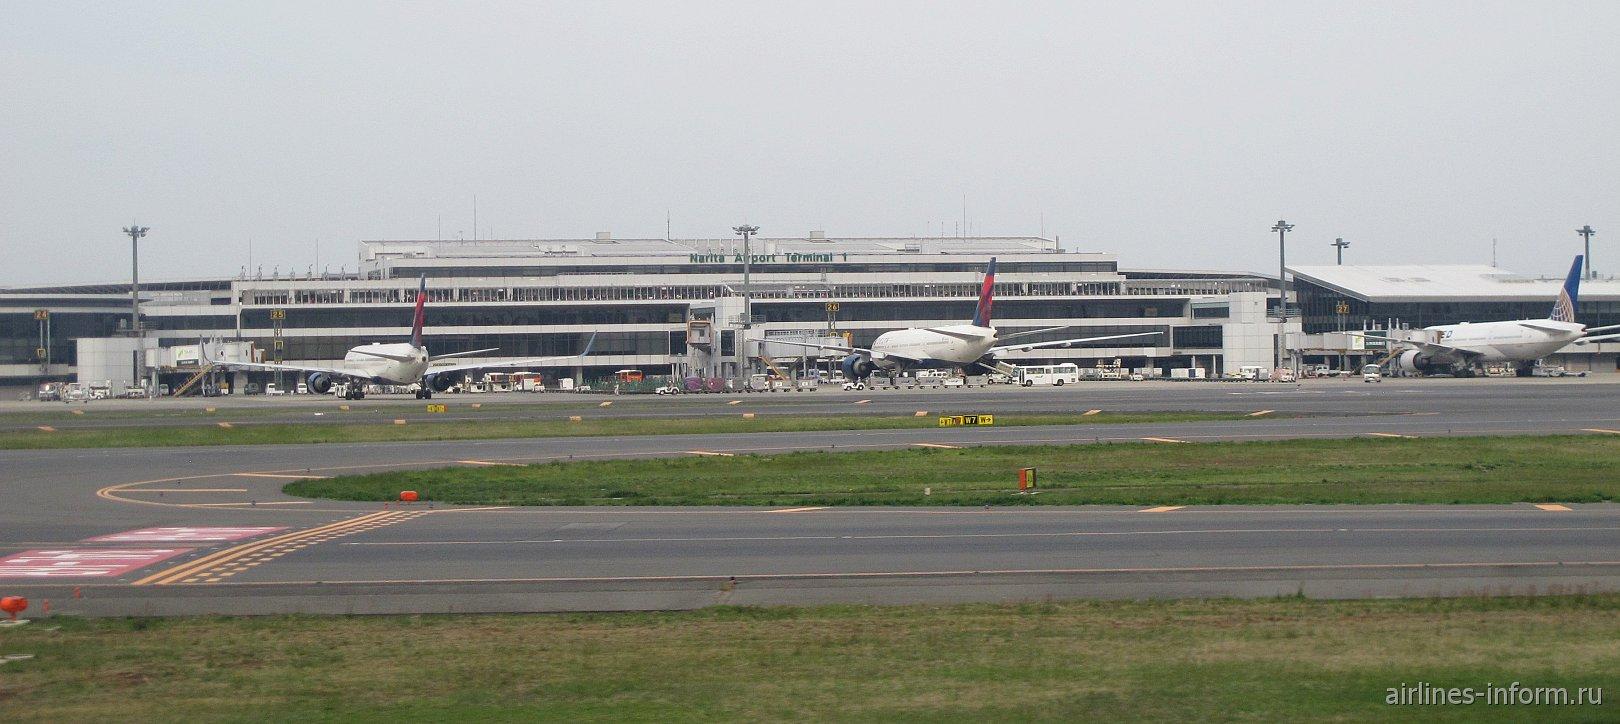 Терминал 1 аэропорта Токио Нарита